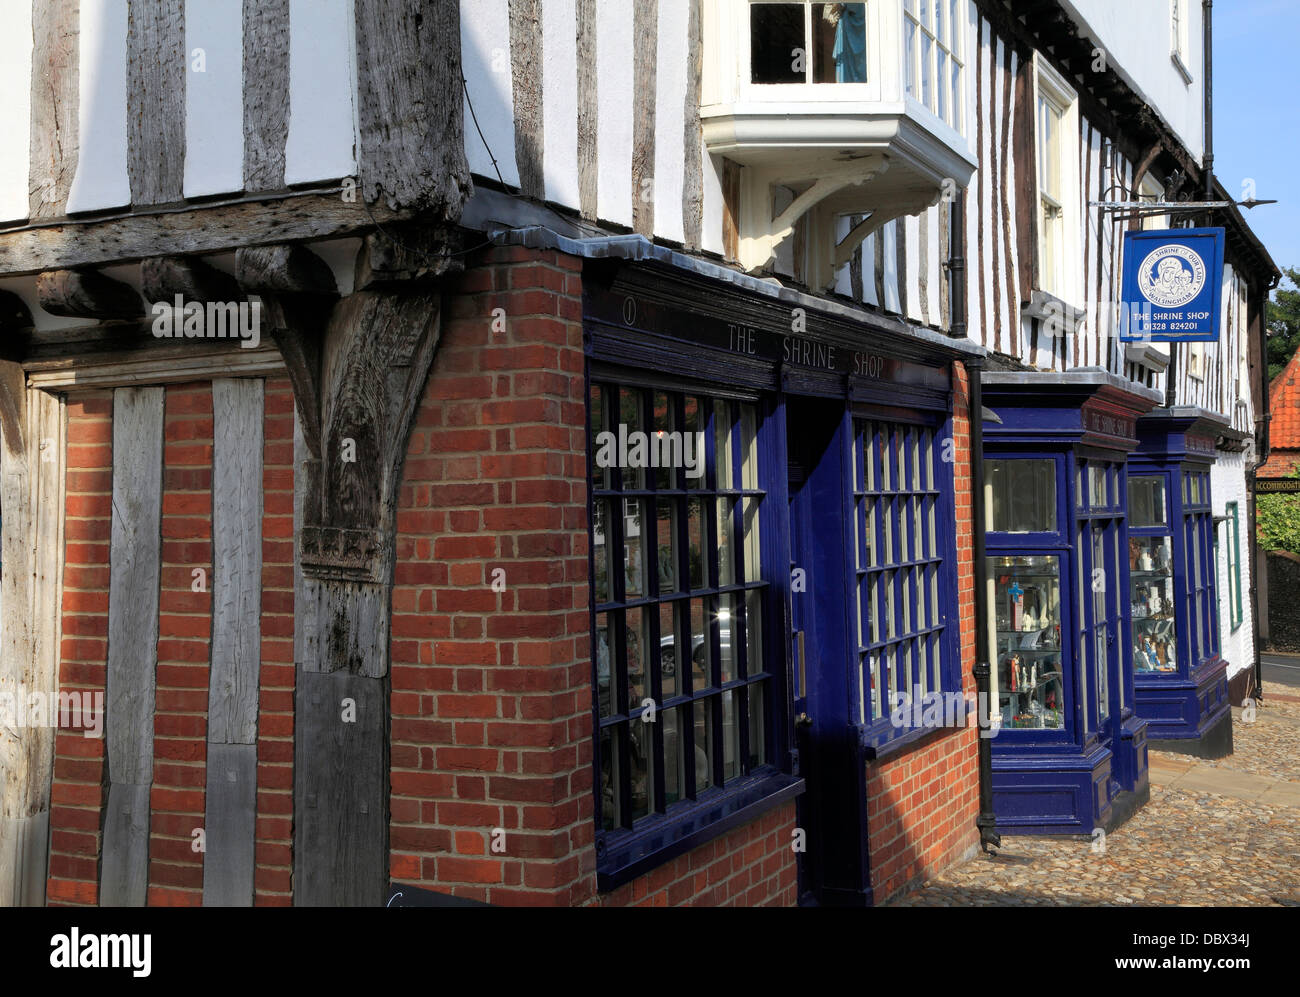 Walsingham Norfolk, The Shrine Shop, Common Place, England UK, late 15th century English architecture shops - Stock Image